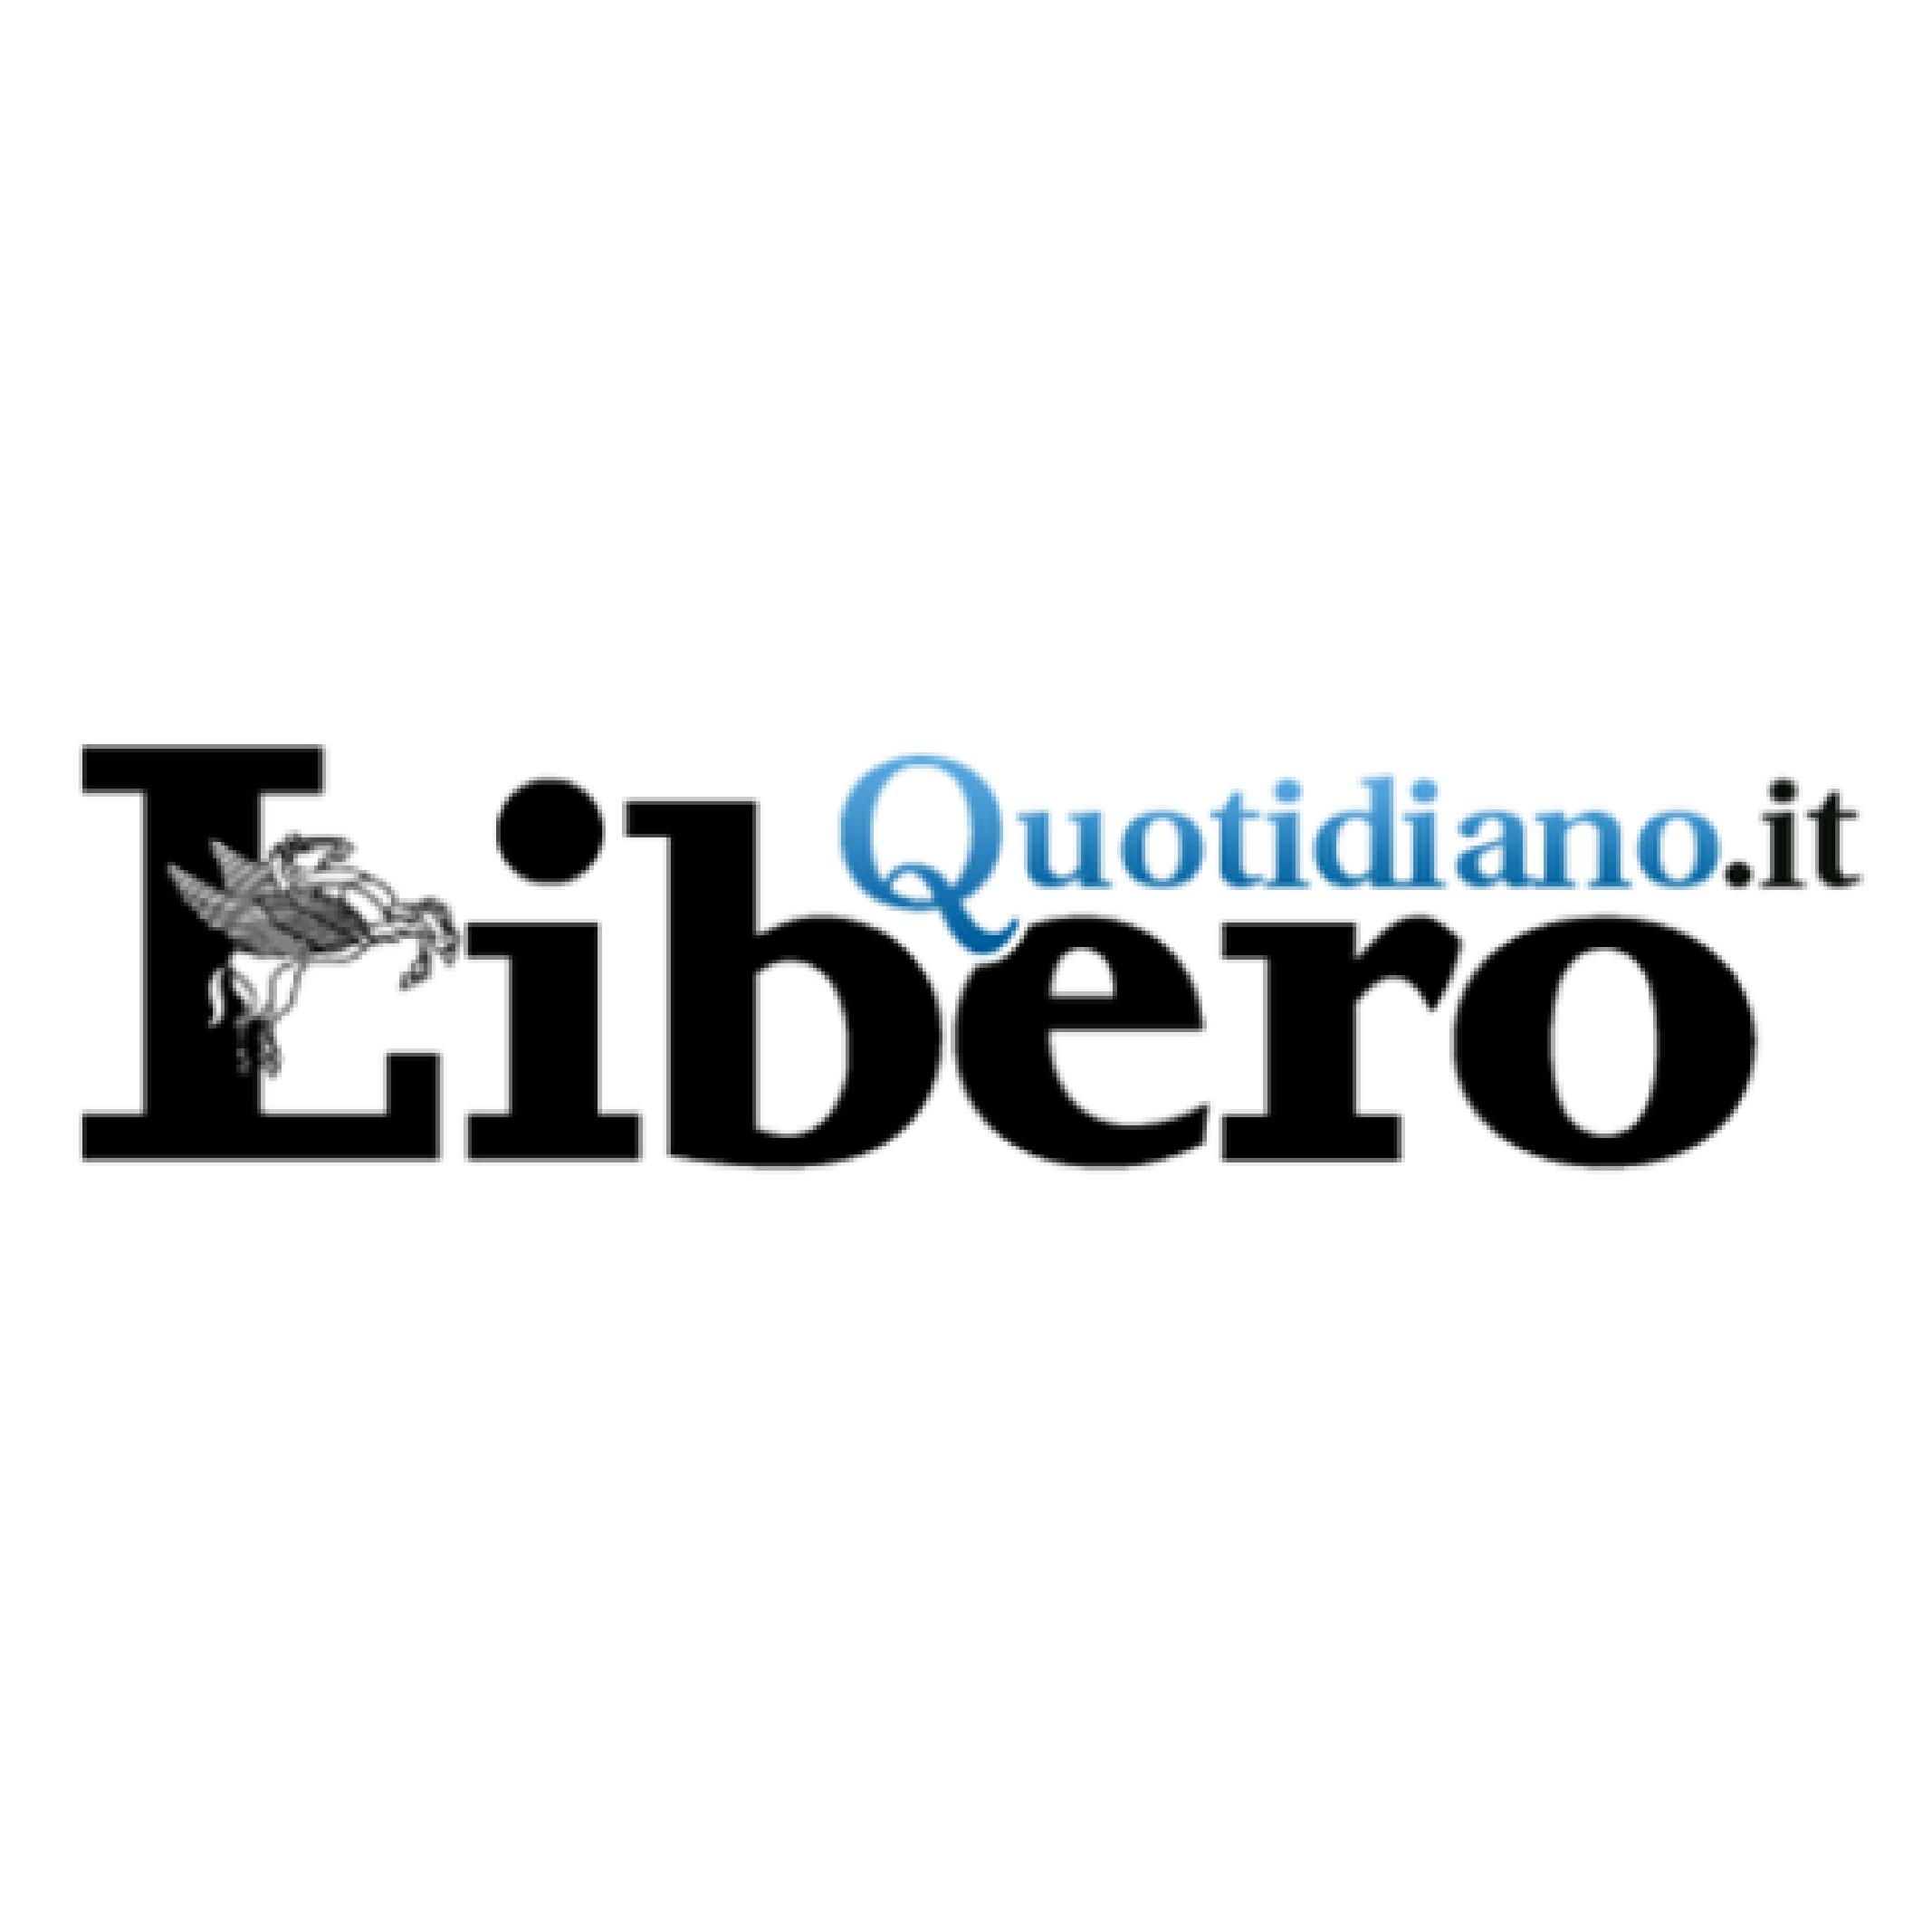 LiberoQuotidiano.it